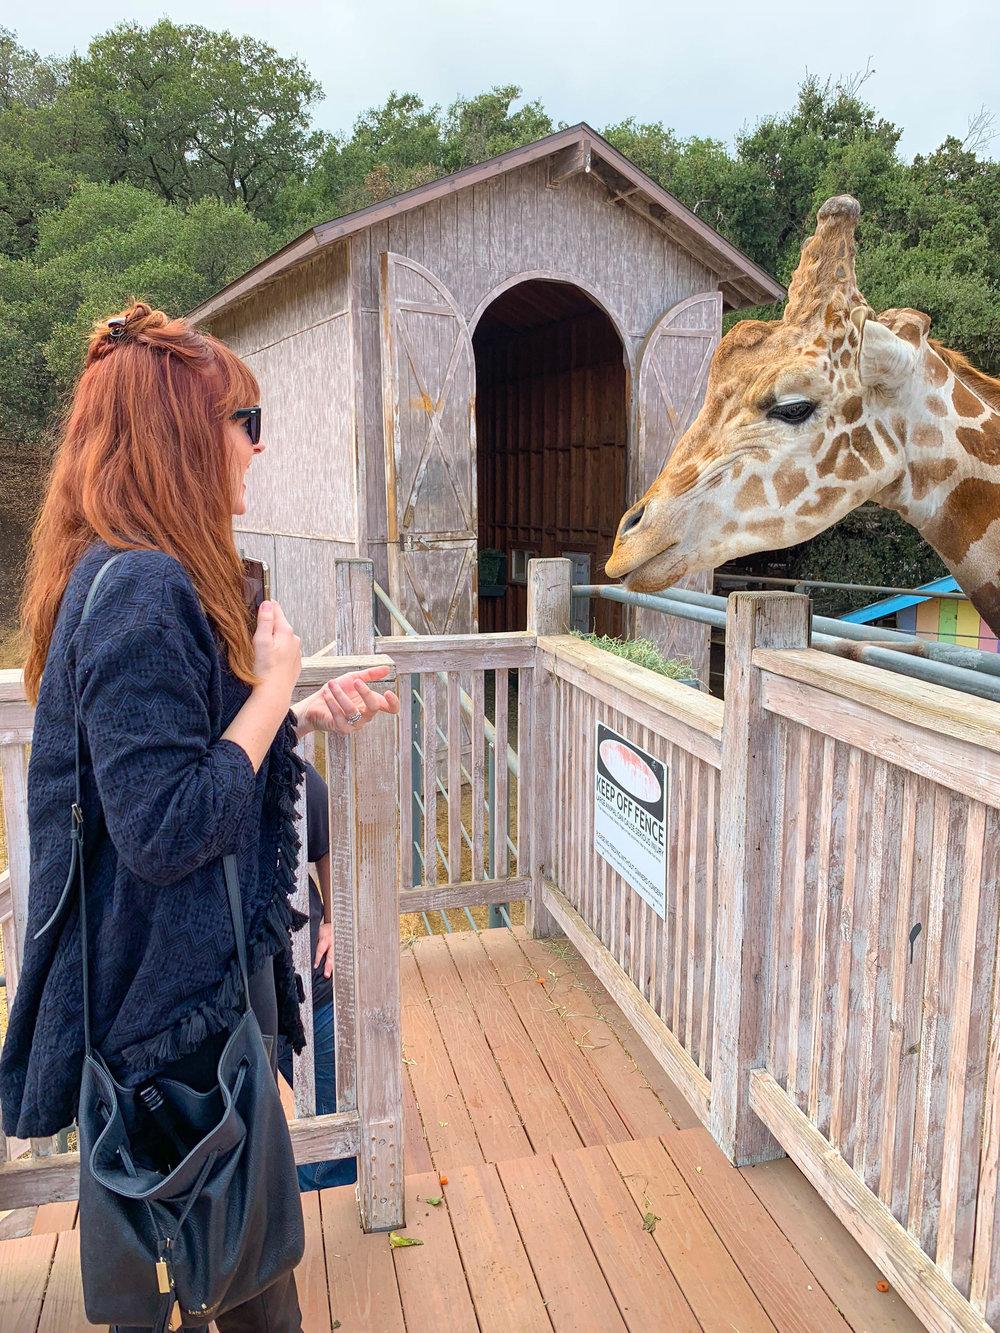 Malibu Wine Safari - Stanley the Giraffe - Wine Tasting